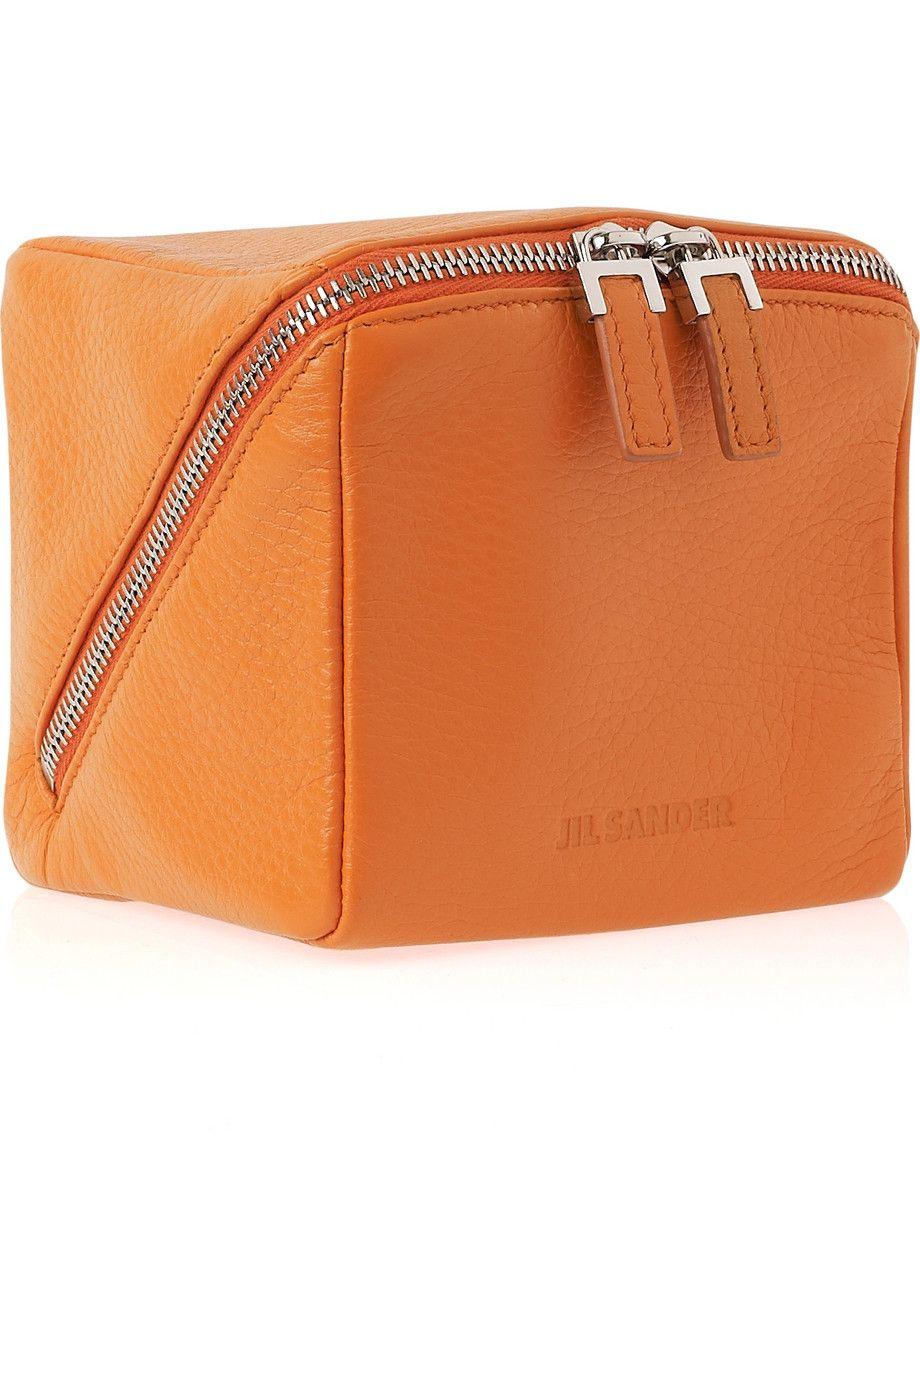 6d6561f2ccd5 Jil Sander, square textured-leather cosmetics case | + SPARKLE + ...